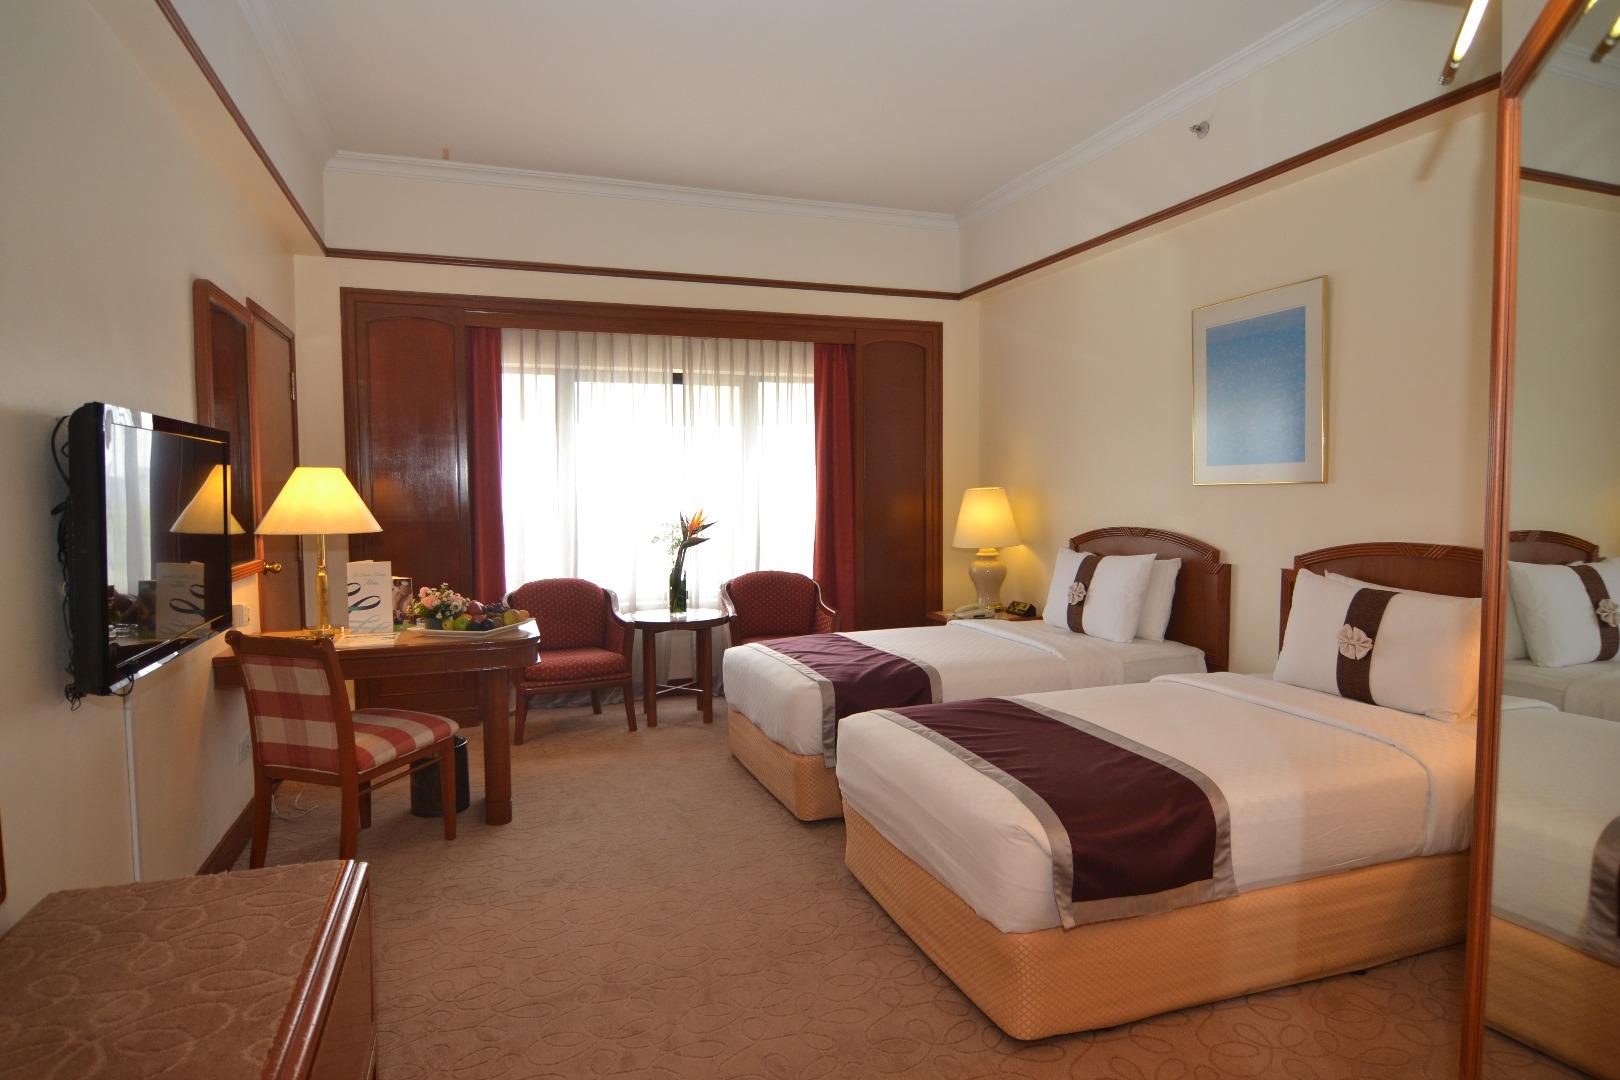 Hotel Sentral Johor Bahru The Official The Puteri Pacific Johor Bahru